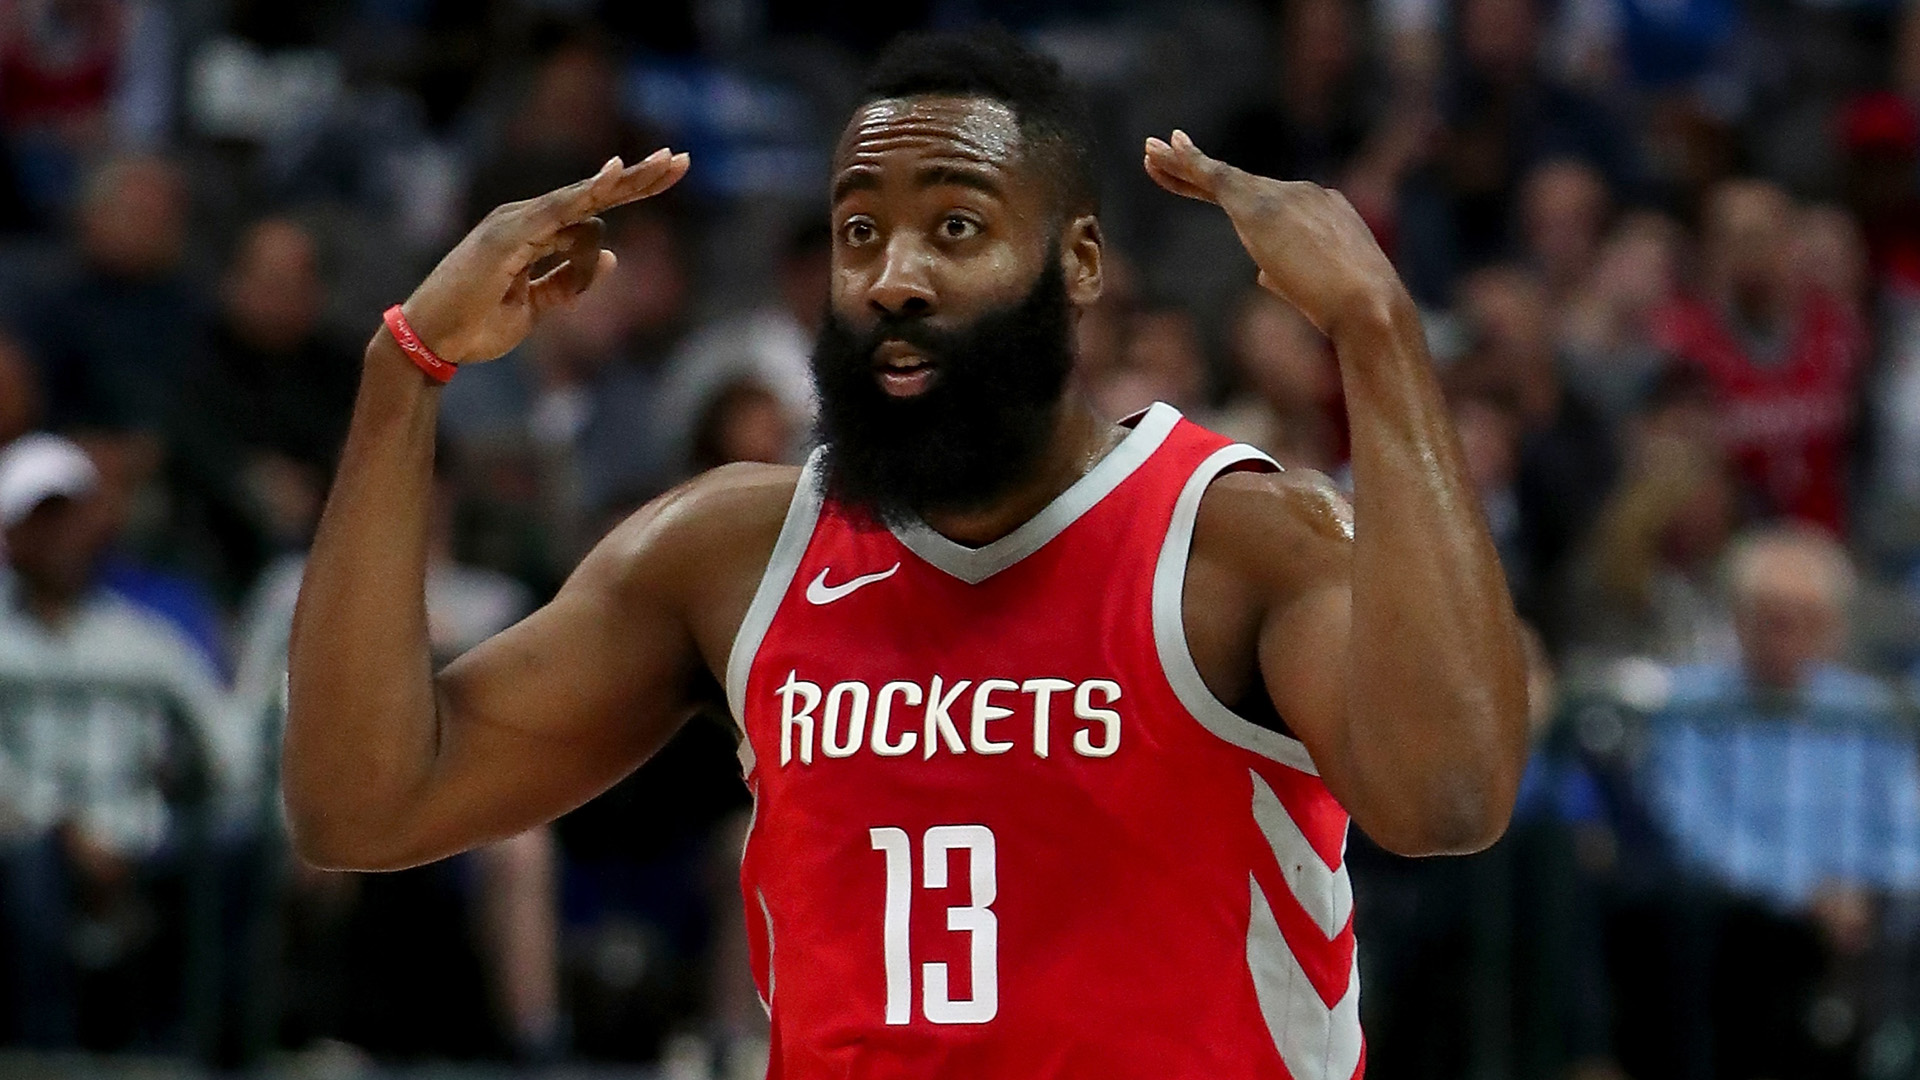 The Houston Rockets extended their winning streak in the NBA, beating the Boston Celtics.